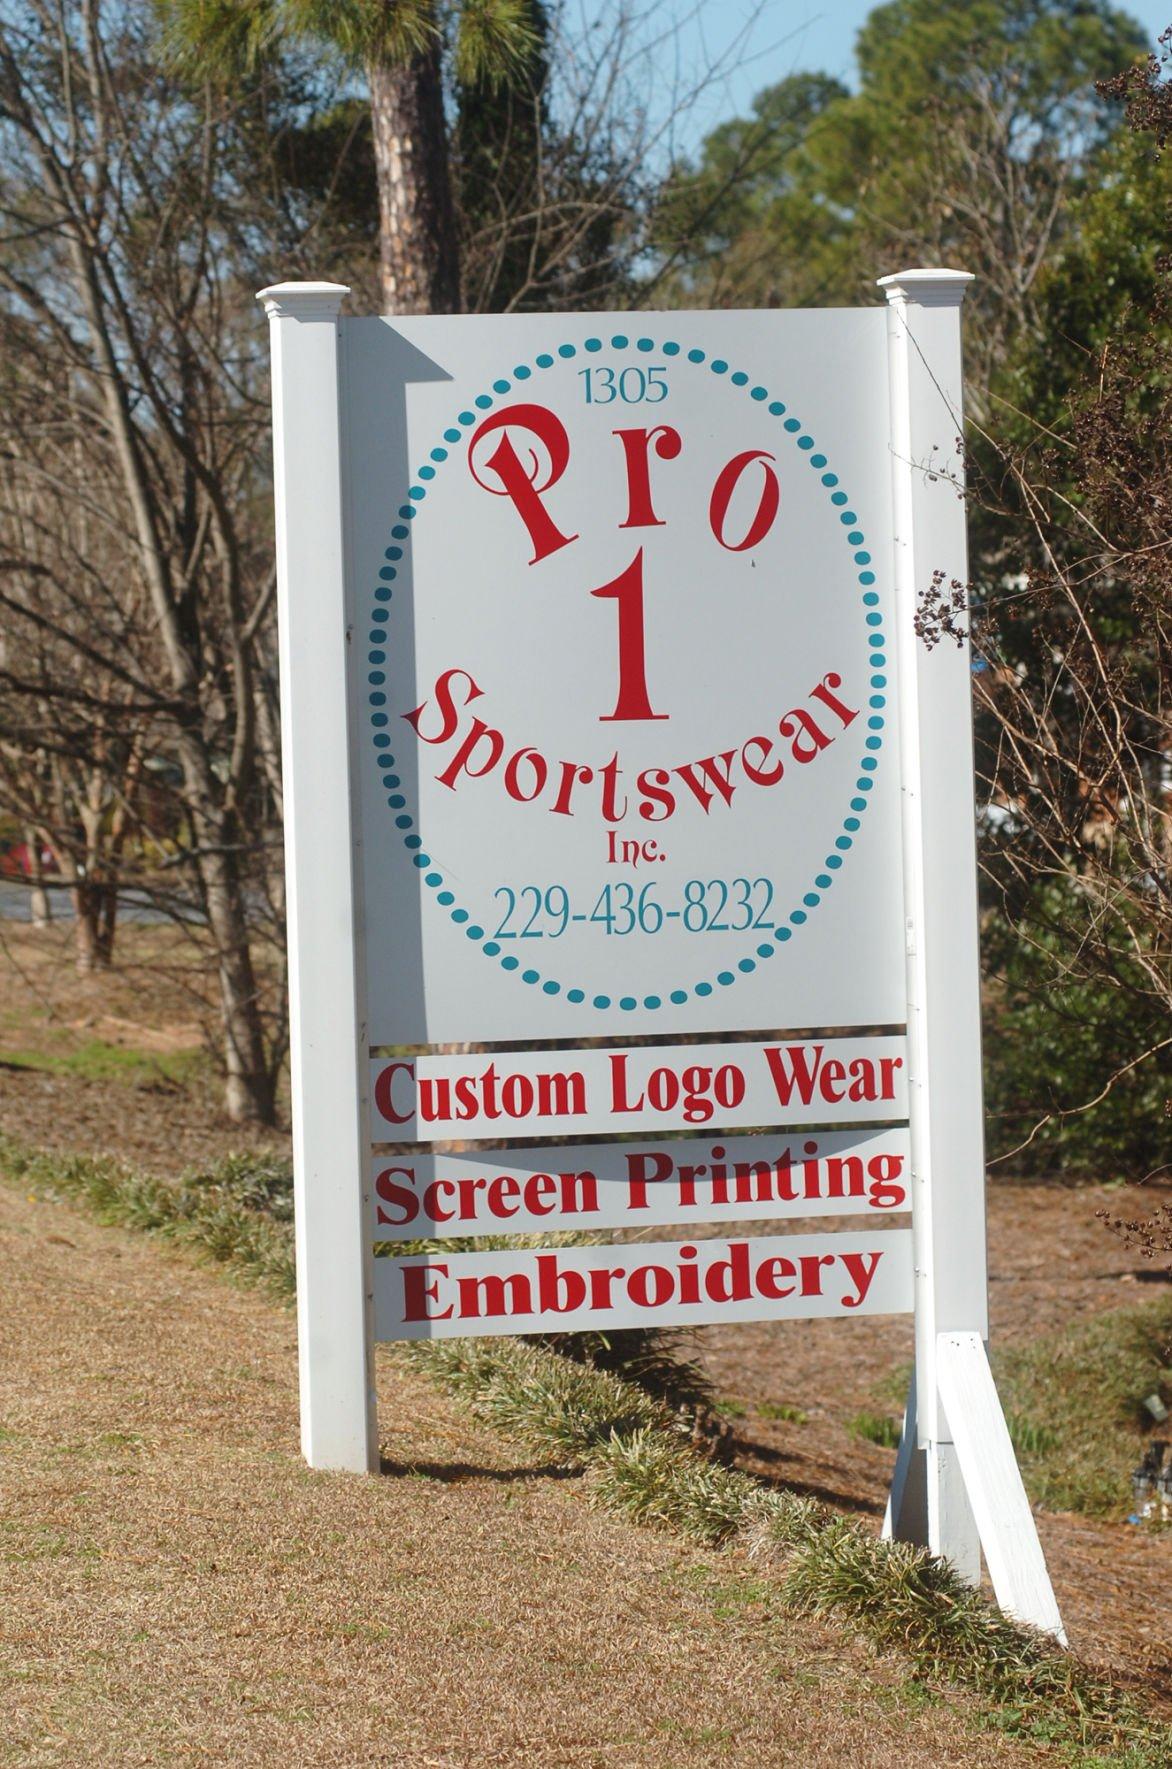 Pro 1 Sportswear Inc. provides embroidery, custom logos ...